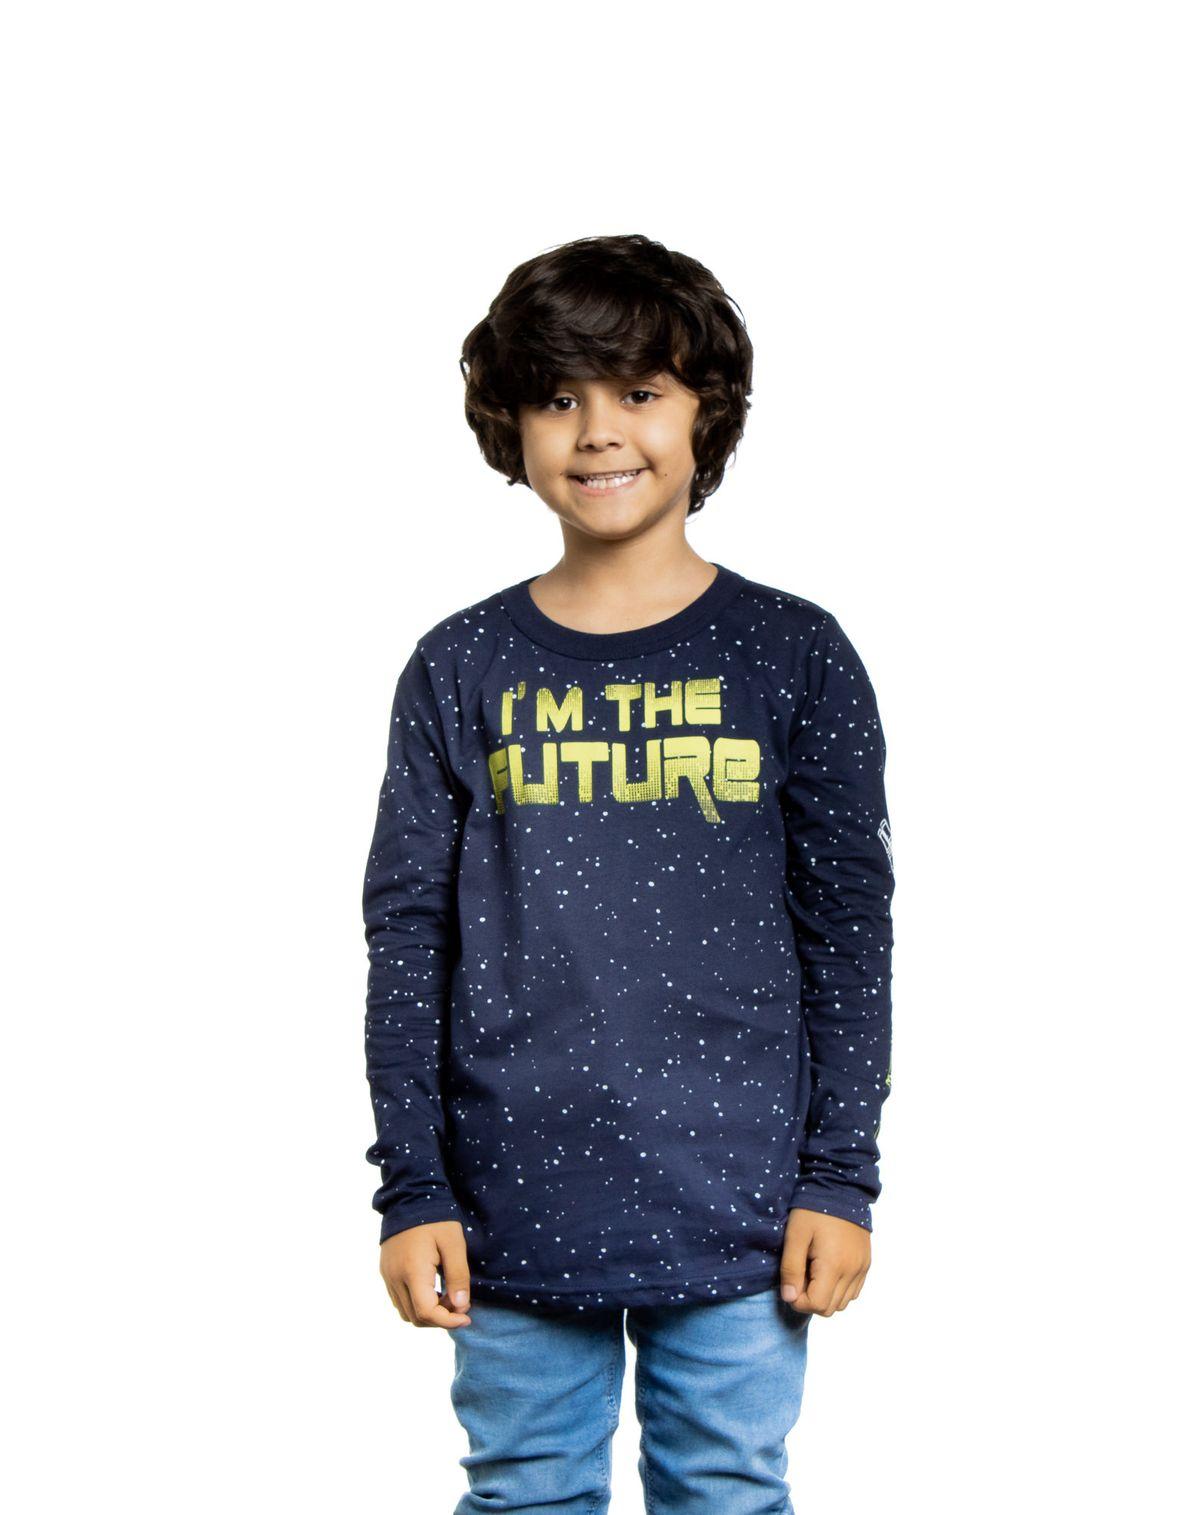 578001003-camiseta-manga-longa-infantil-menino-estampa-espacial-marinho-8-891